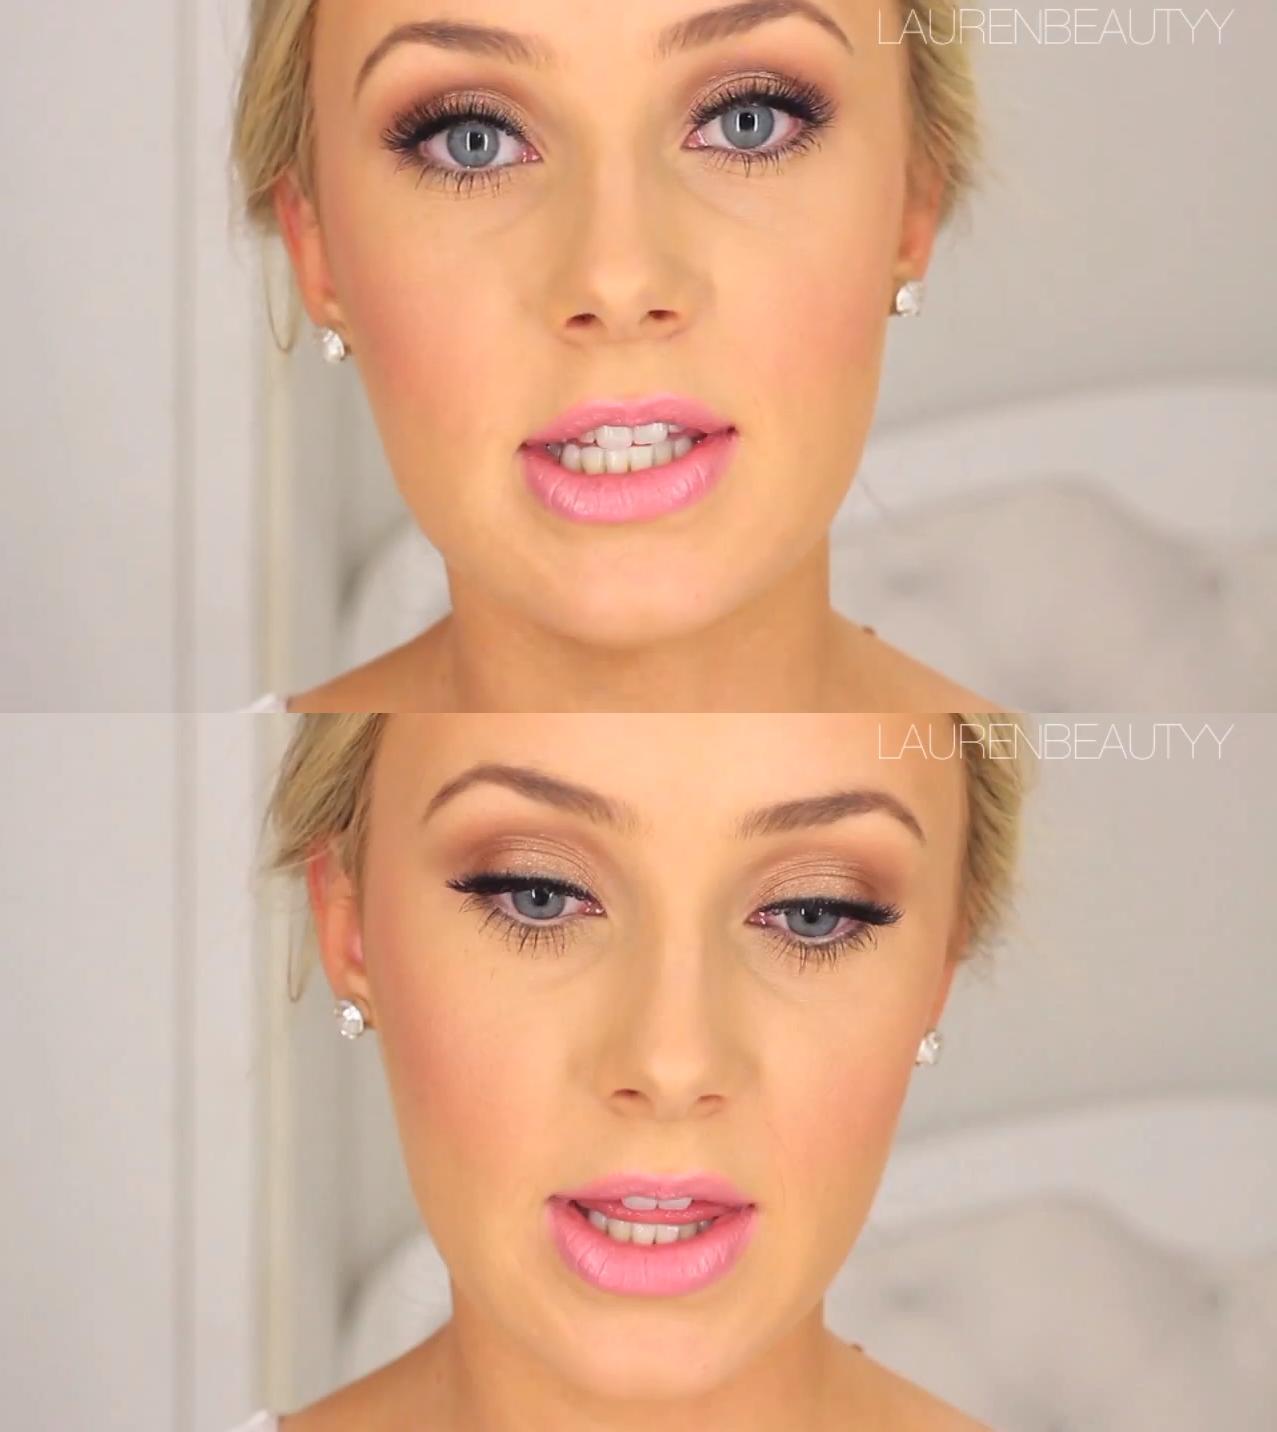 Bridal Makeup By Laurenbeautyy